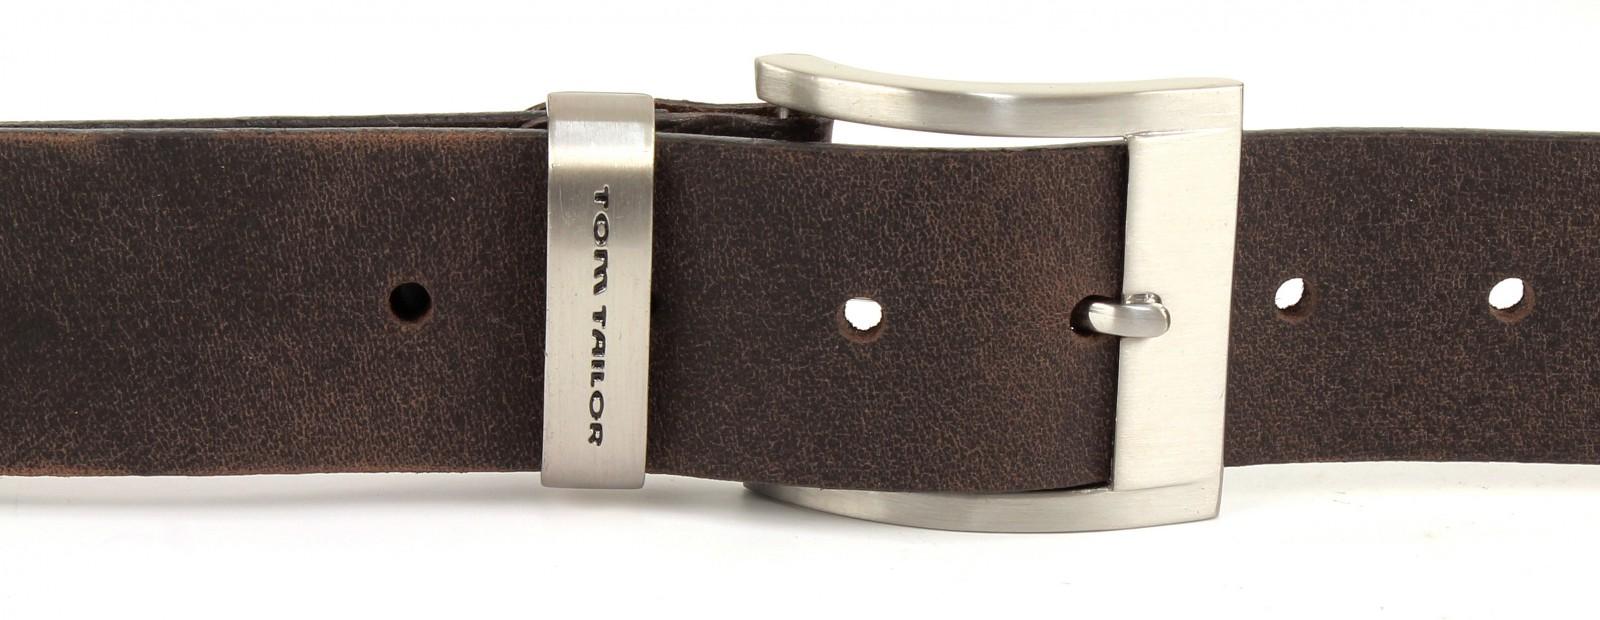 TOM TAILOR Belt TG1165H31 W110 Dark Brown